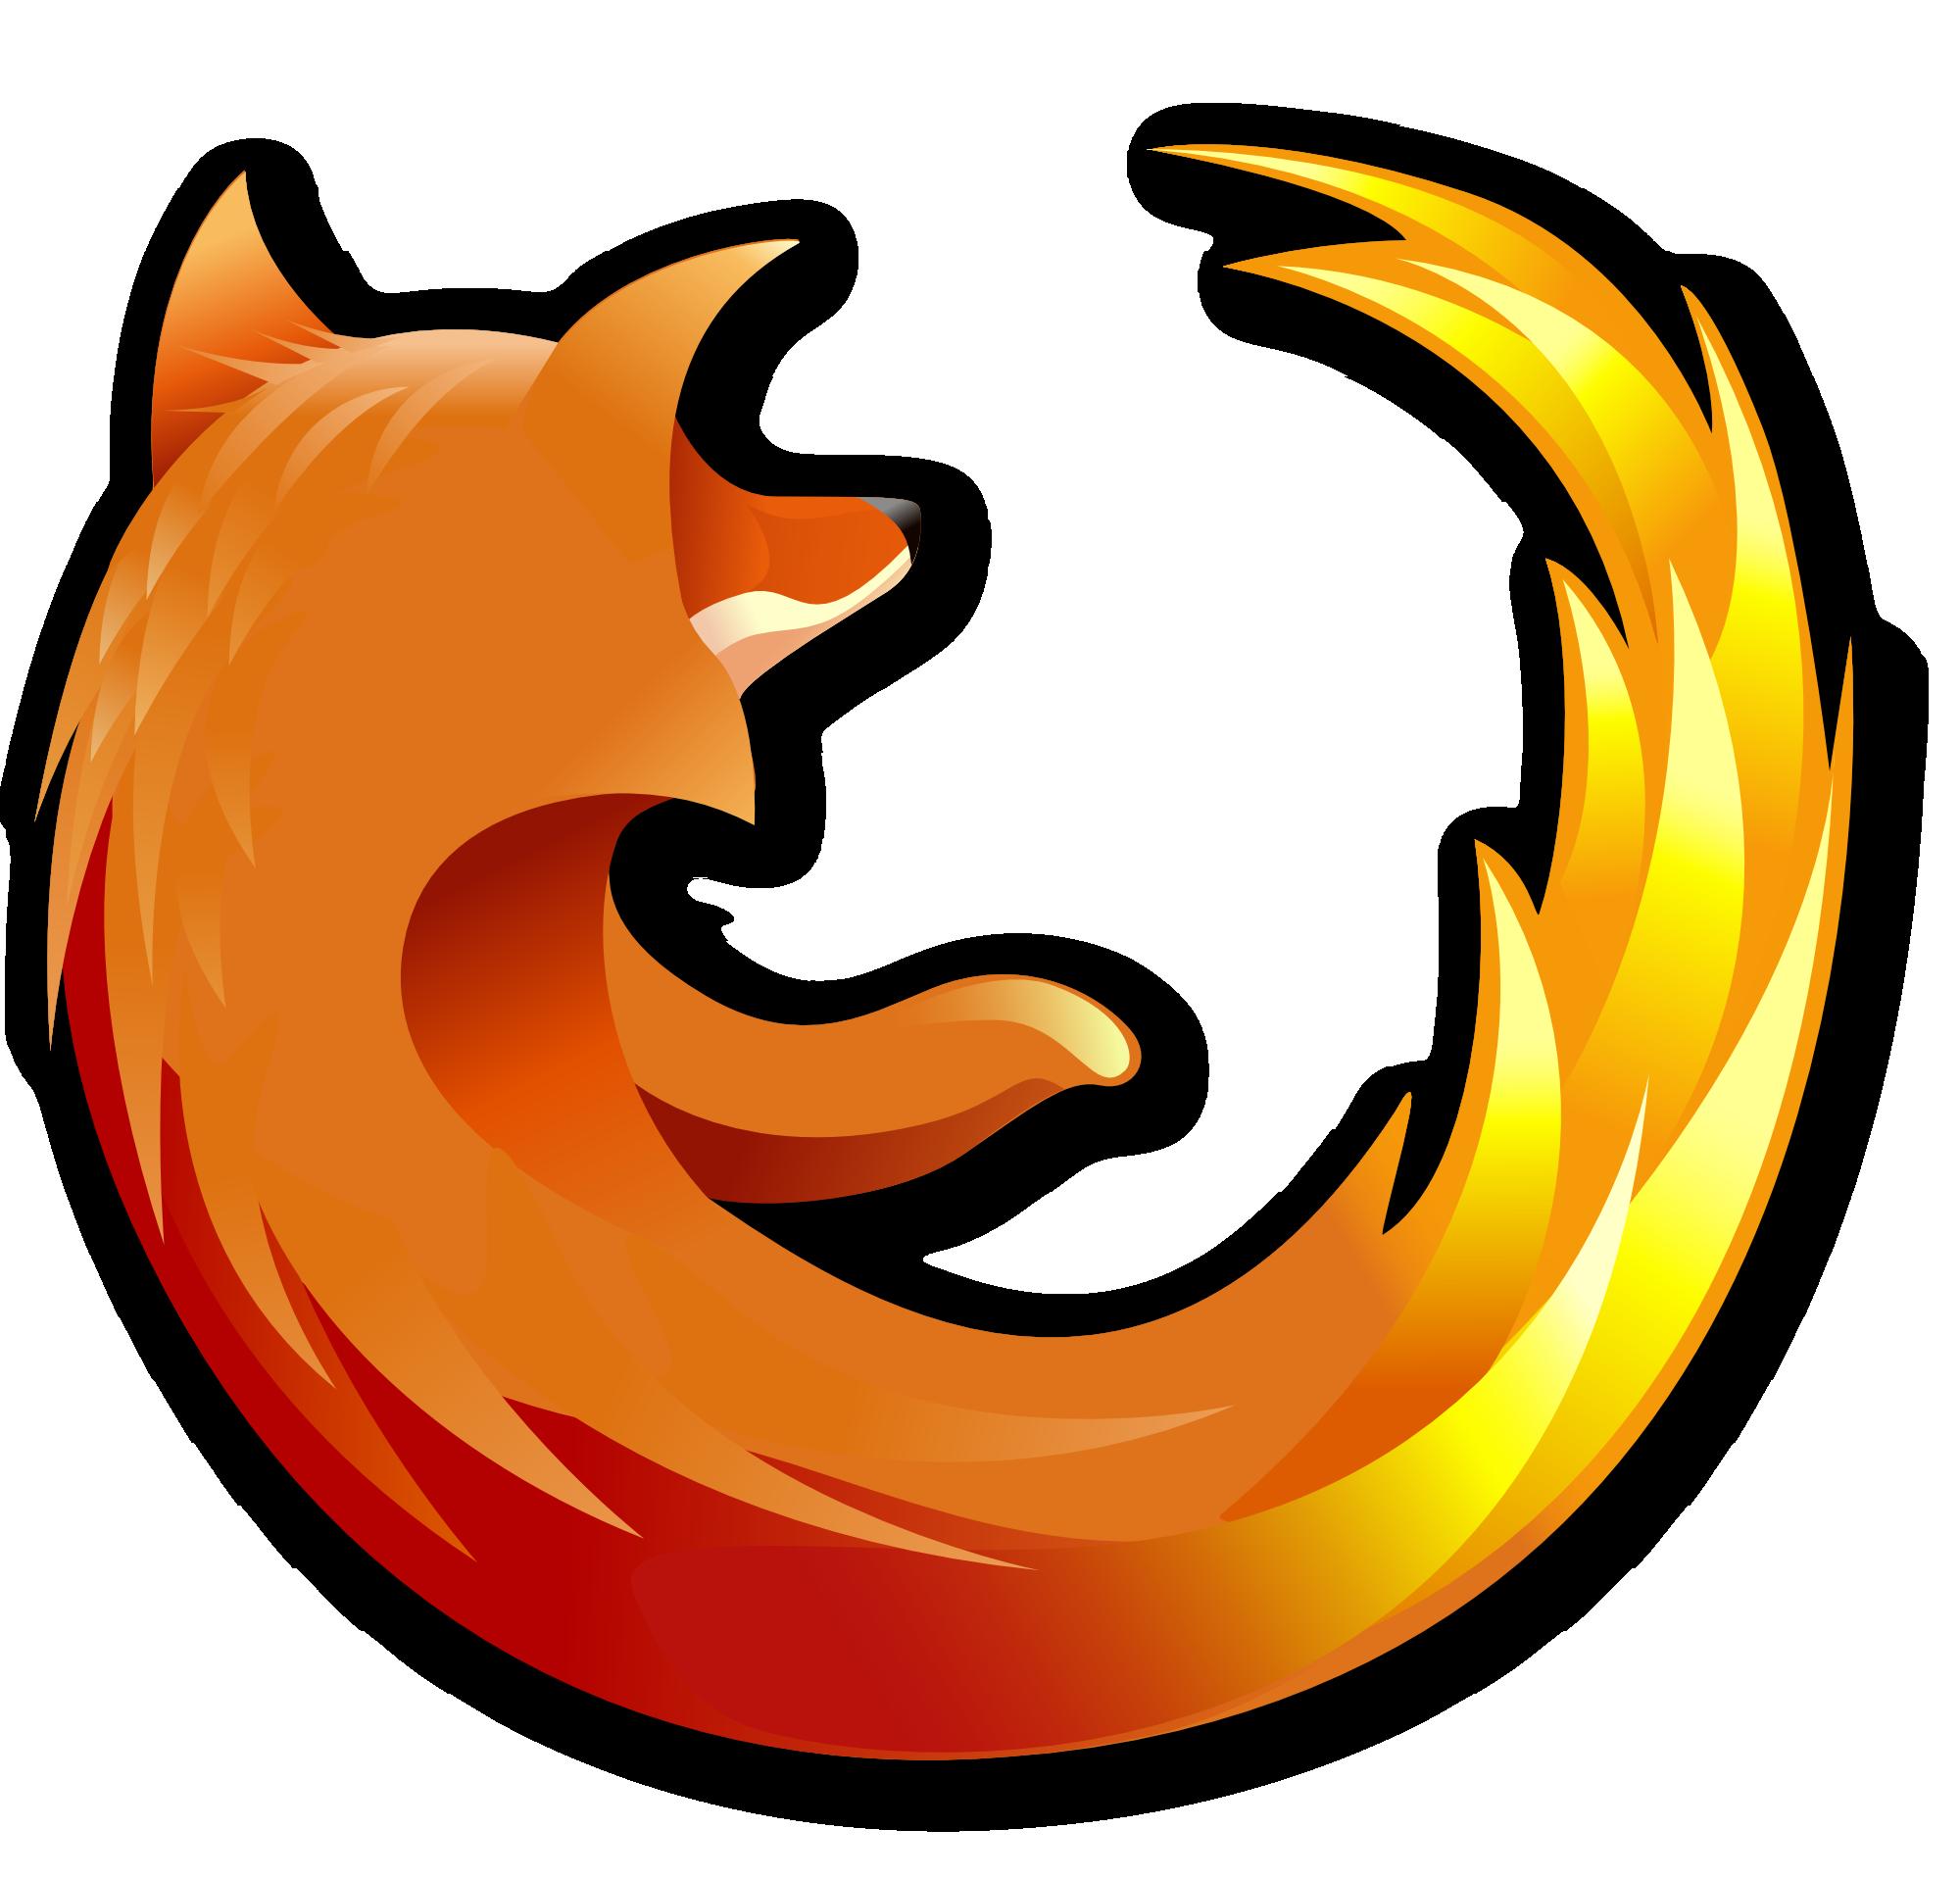 firefox logo without globe by balcsida on deviantart